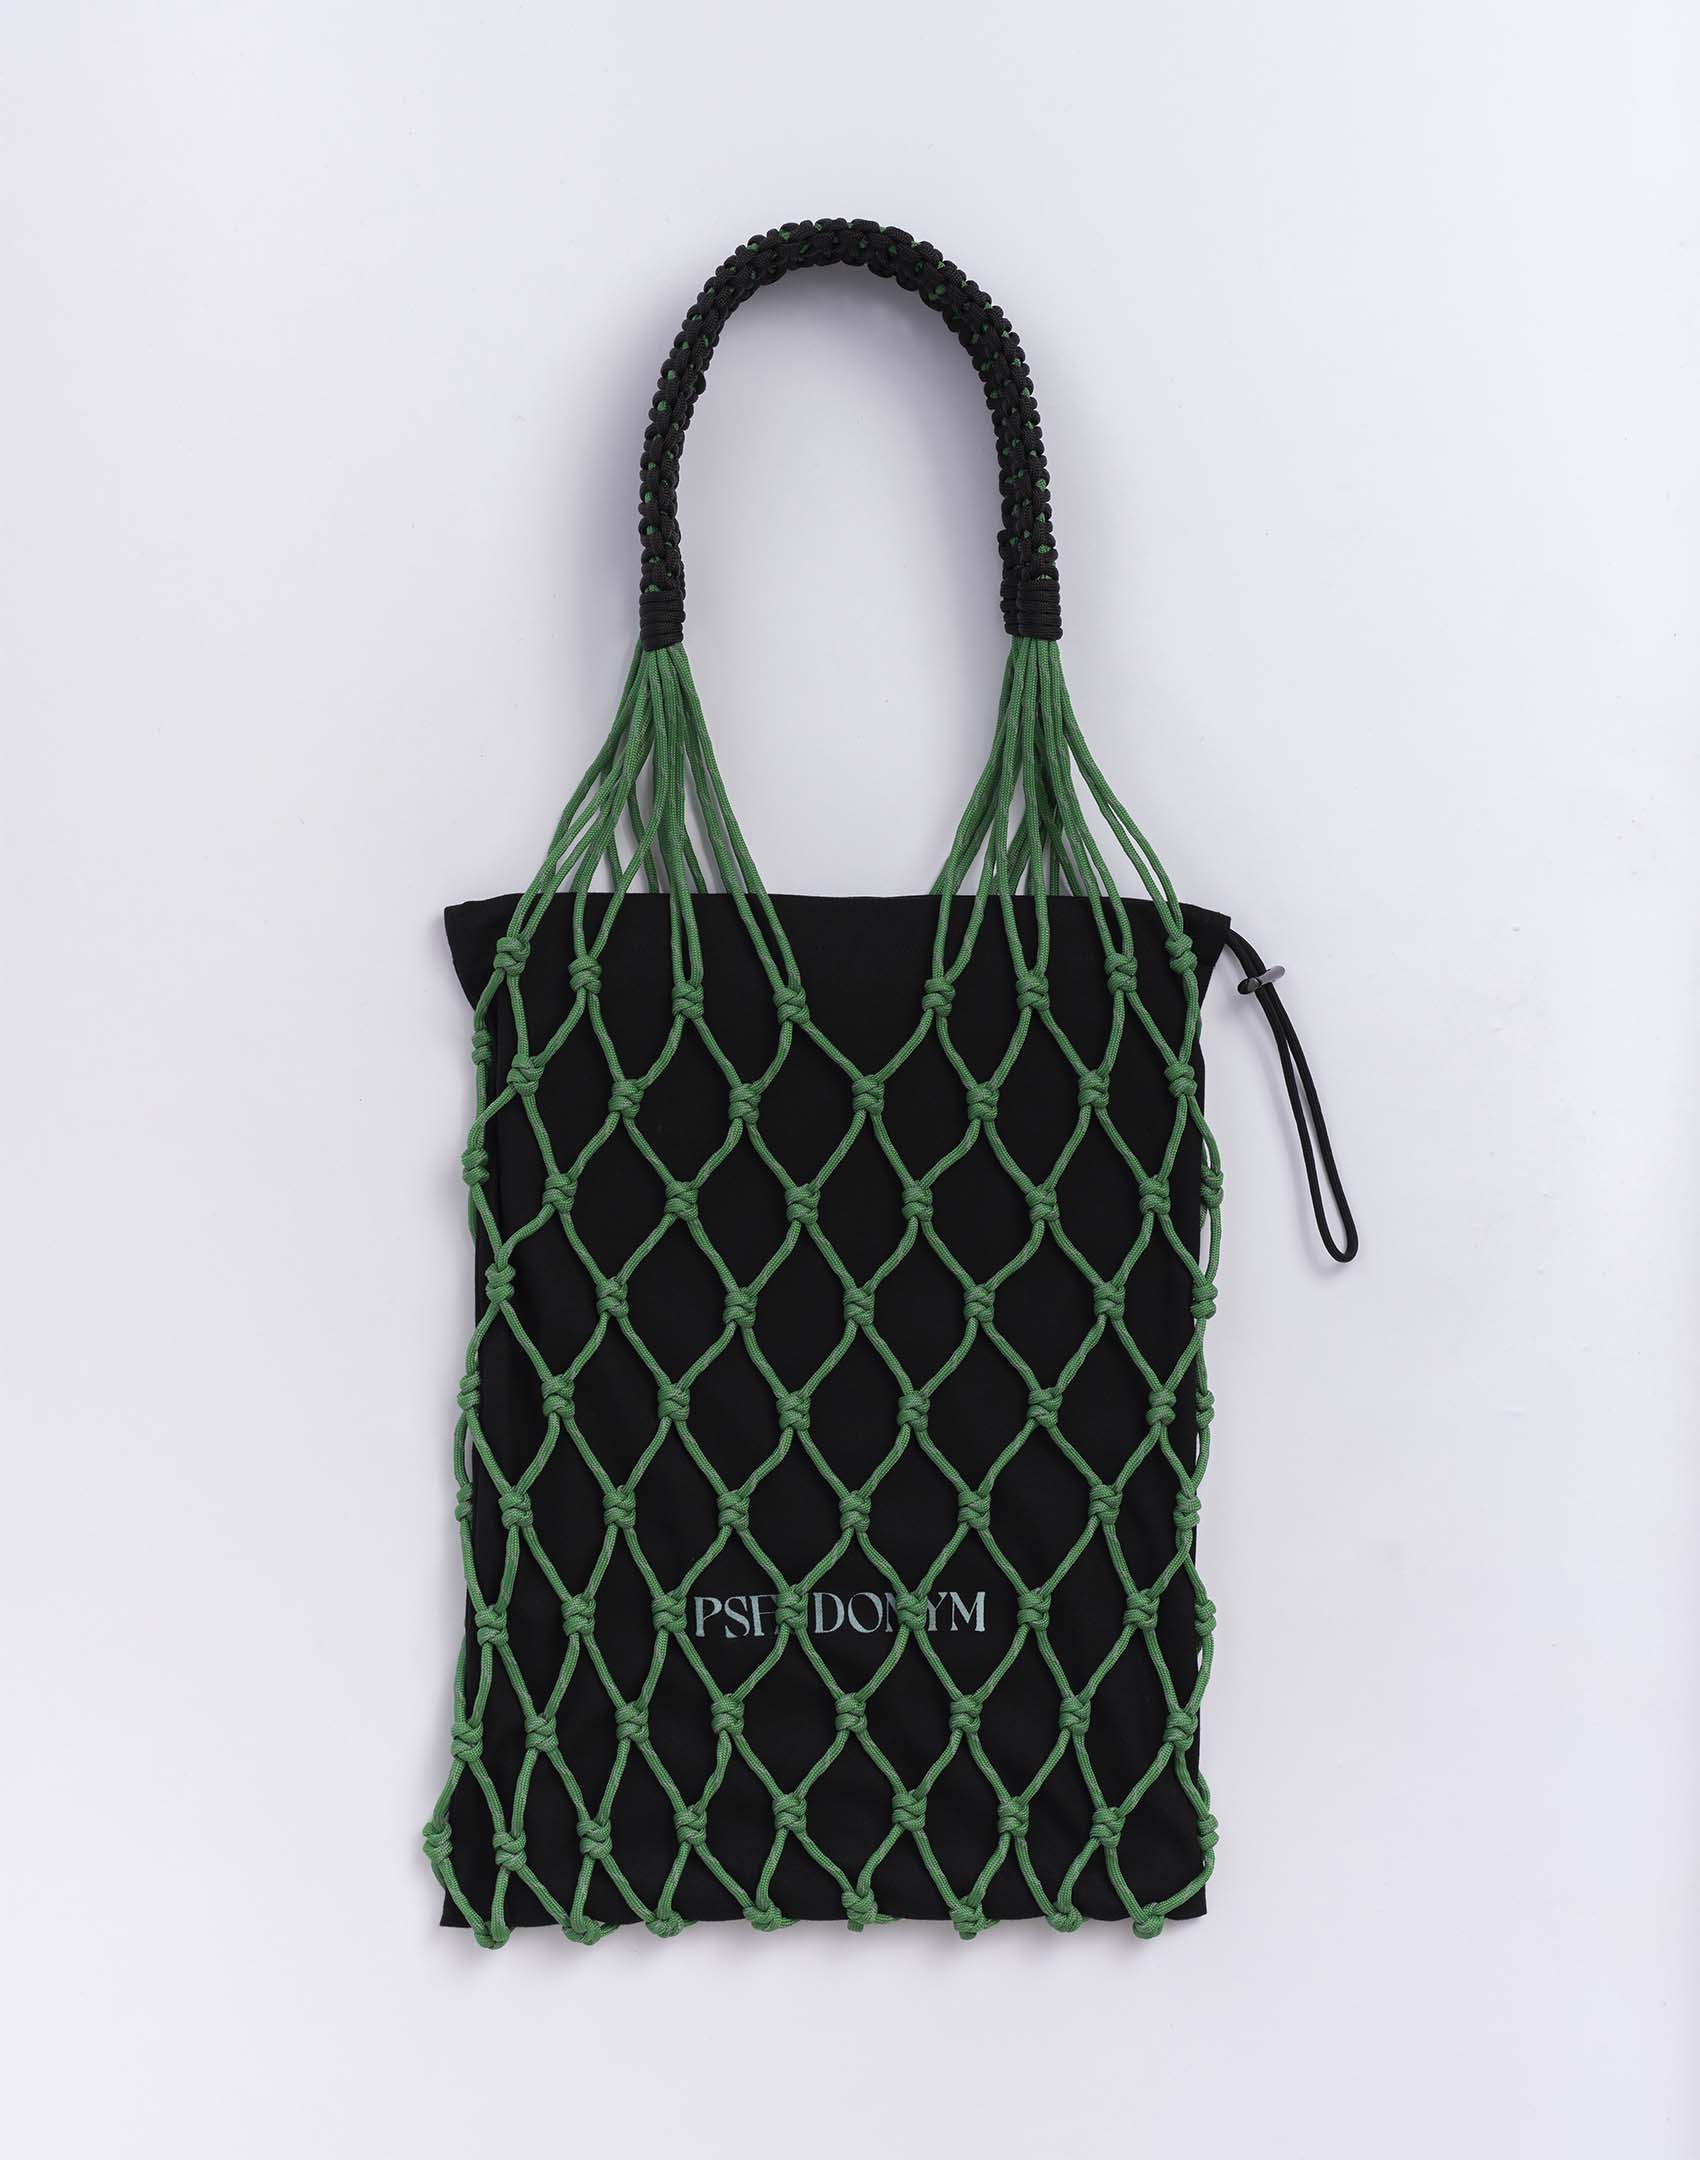 P.S. Field Bag 07 (Hulk Nude), green reflective/black colorway.